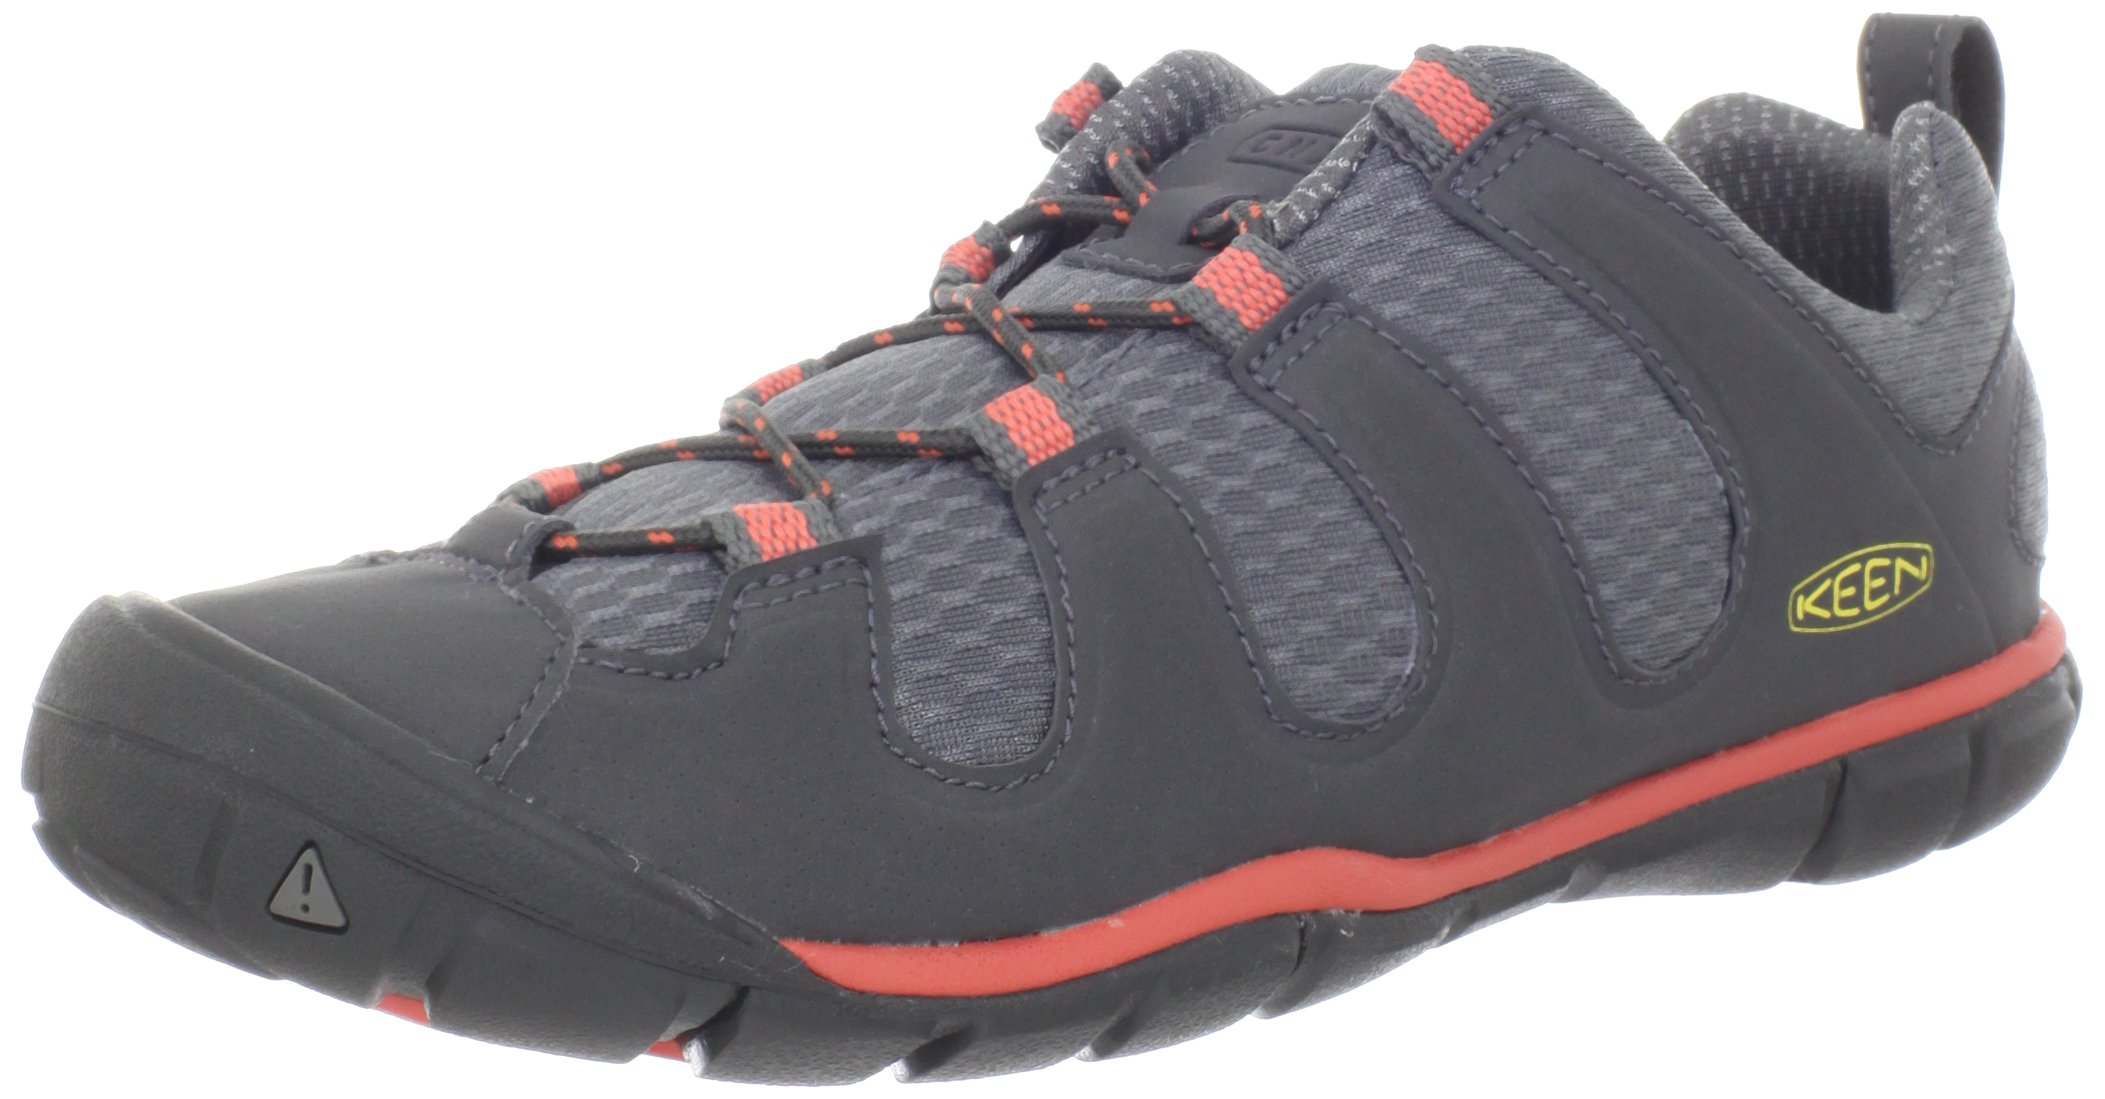 KEEN Women's Haven CNX Hiking Shoe,Gargoyle/Hot Coral,6 M US